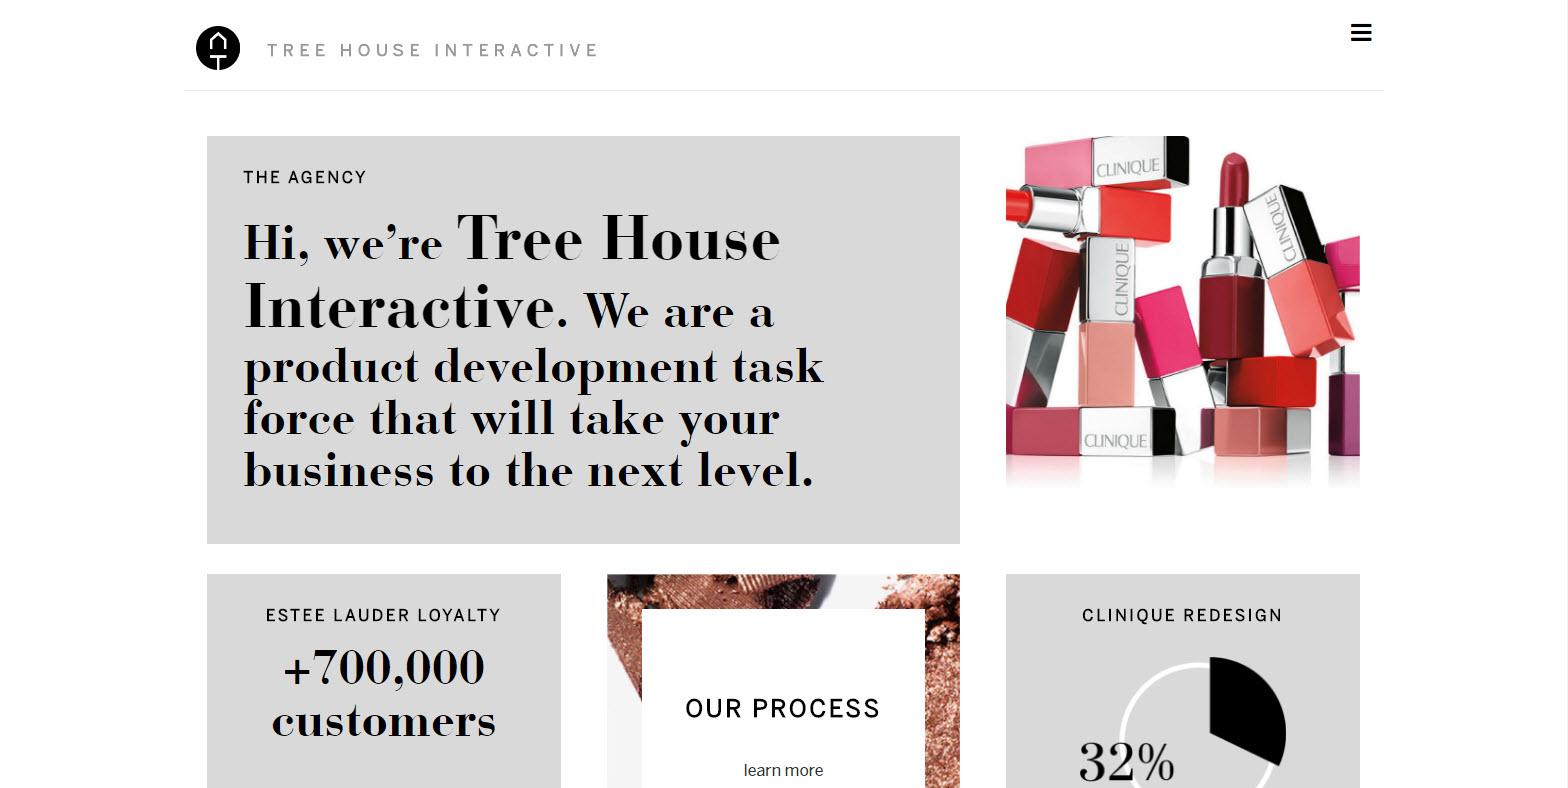 treehouse-interactive.com